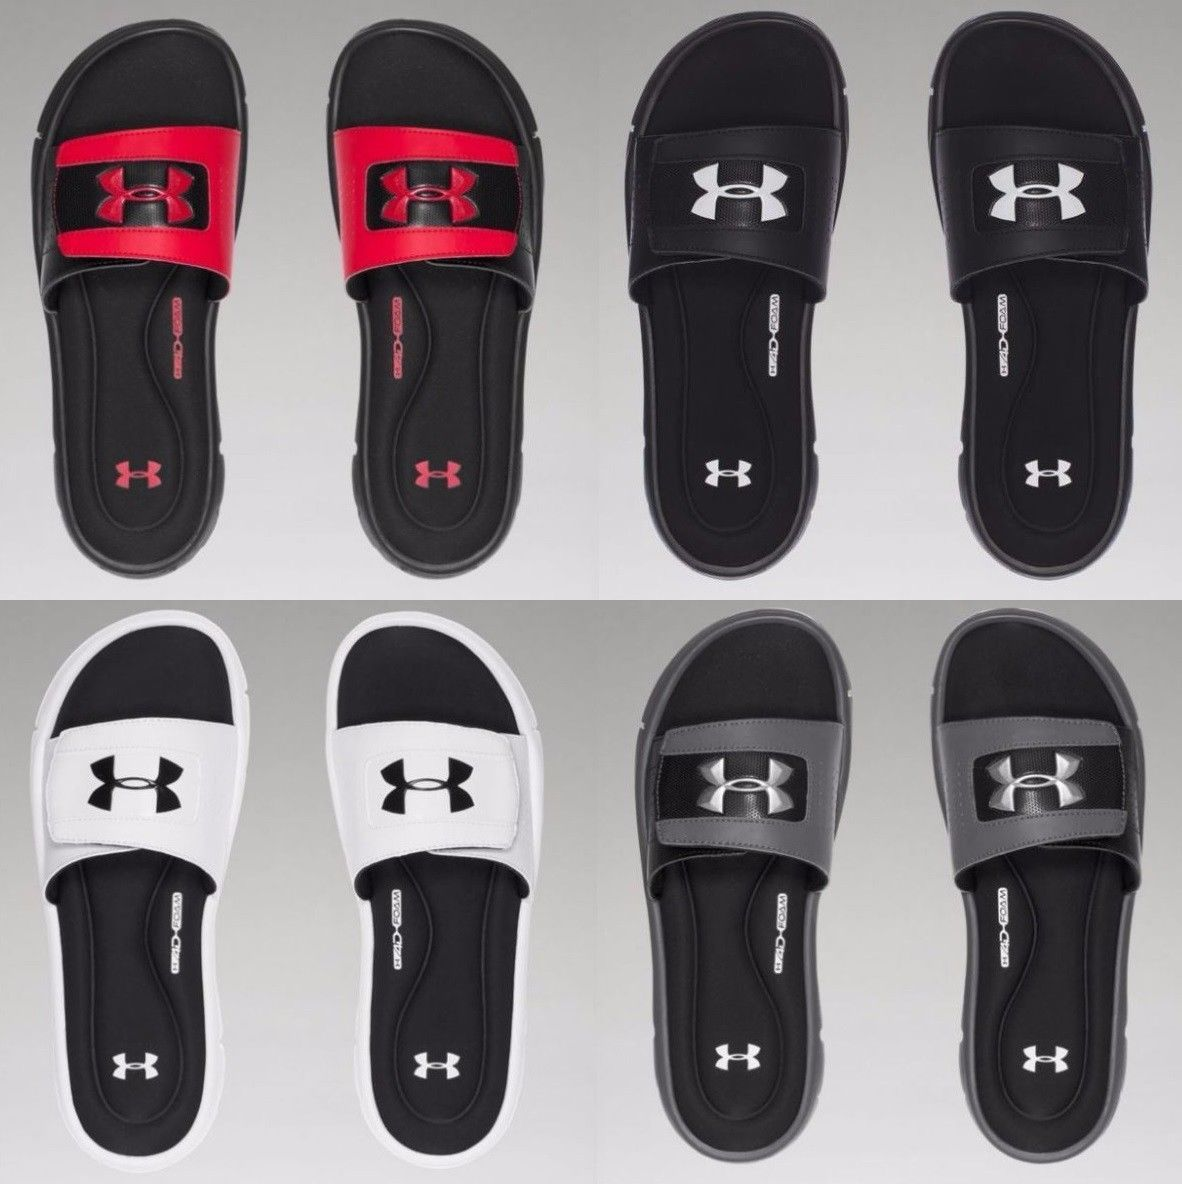 4151e762d8a0 Sandals and Flip Flops 11504  Under Armour Men S Ua Ignite V Slide Foam  Sport Memory Foam Sandals Sizes 8-14 -  BUY IT NOW ONLY   34.95 on eBay!